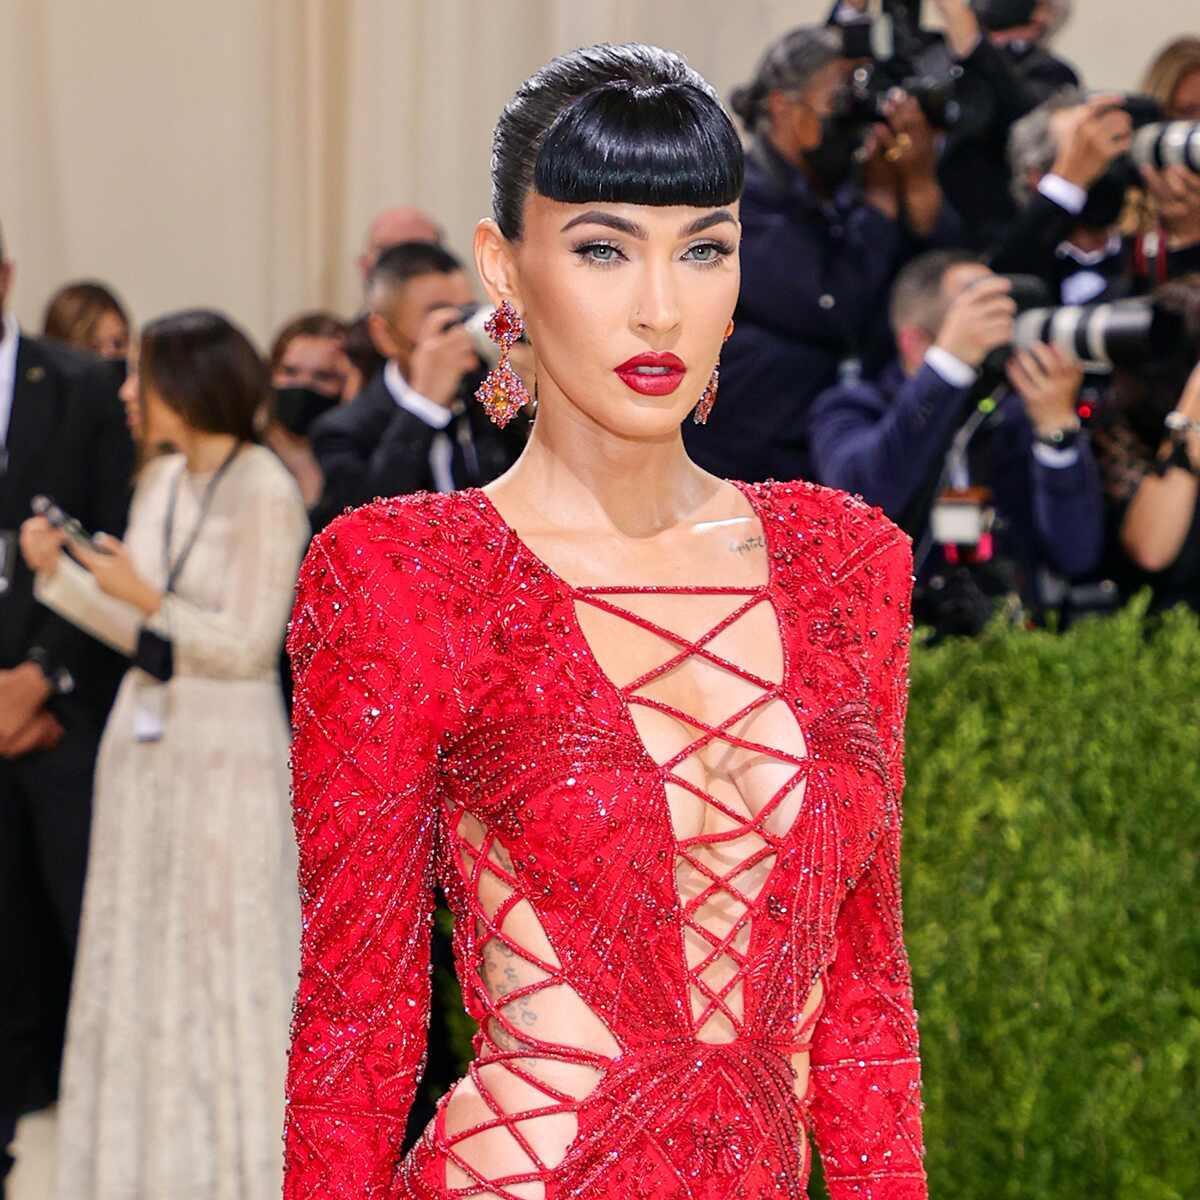 Megan Fox, 2021 Met Gala, Red Carpet Fashion, Arrivals